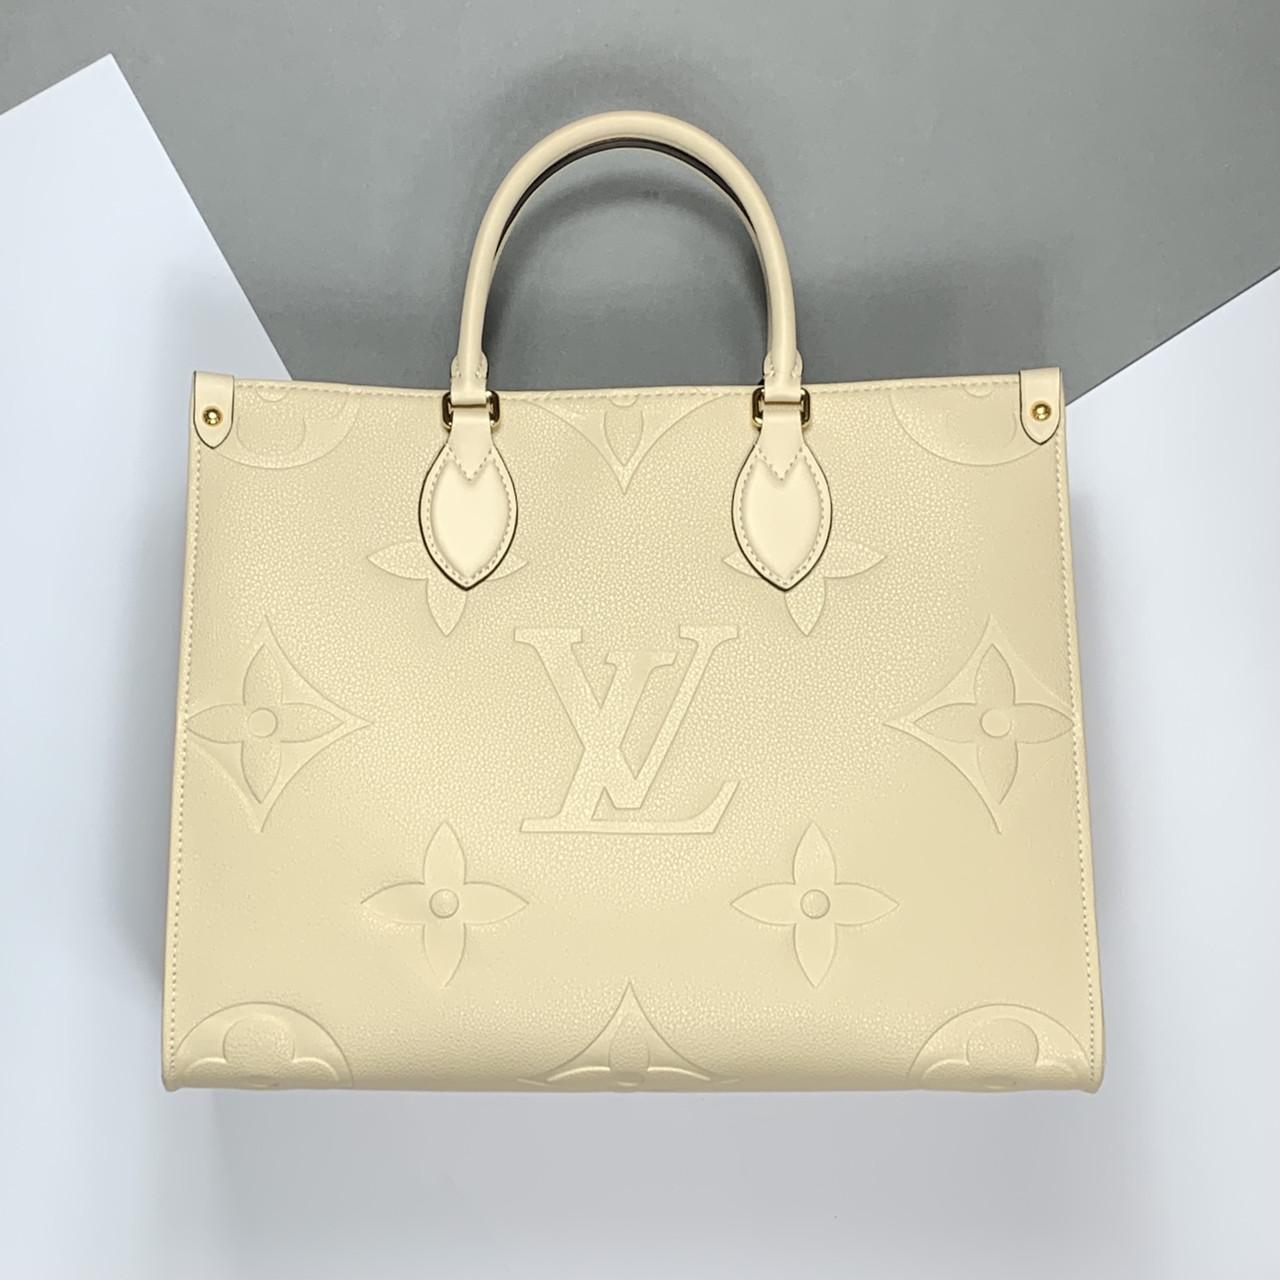 Сумка Louis Vuitton ONTHEGO MM (Луи Виттон Онзего) арт. 03-425